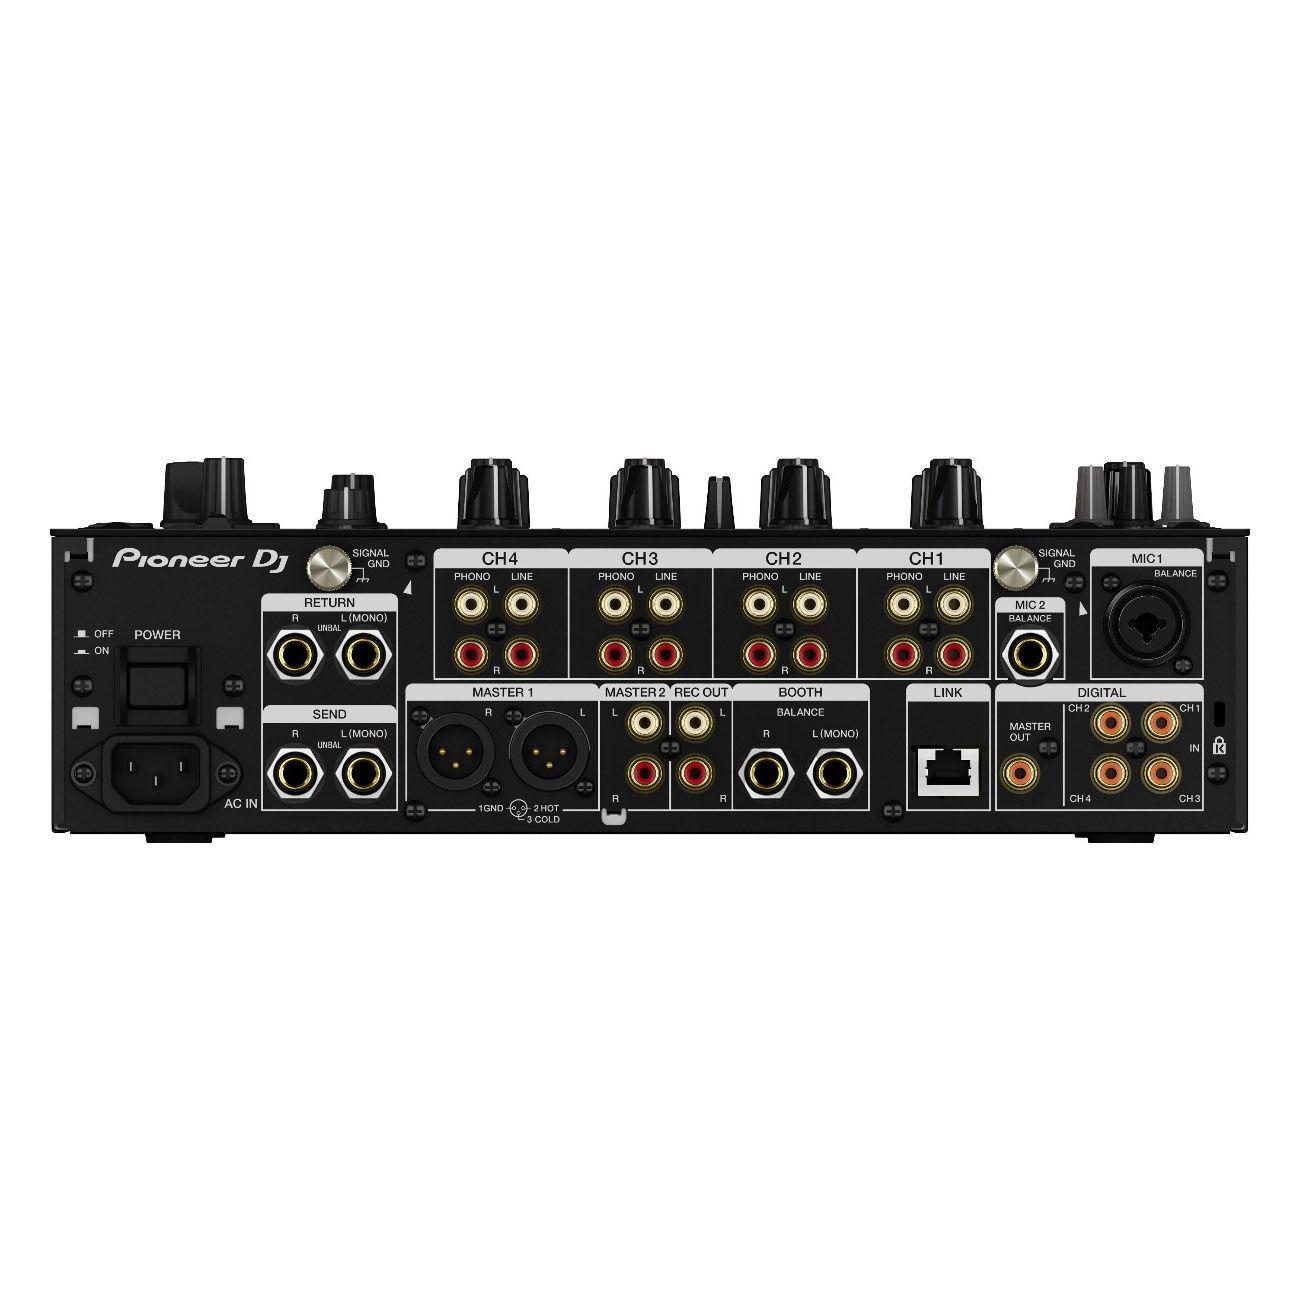 Mixer Pioneer Dj Djm-900nxs2